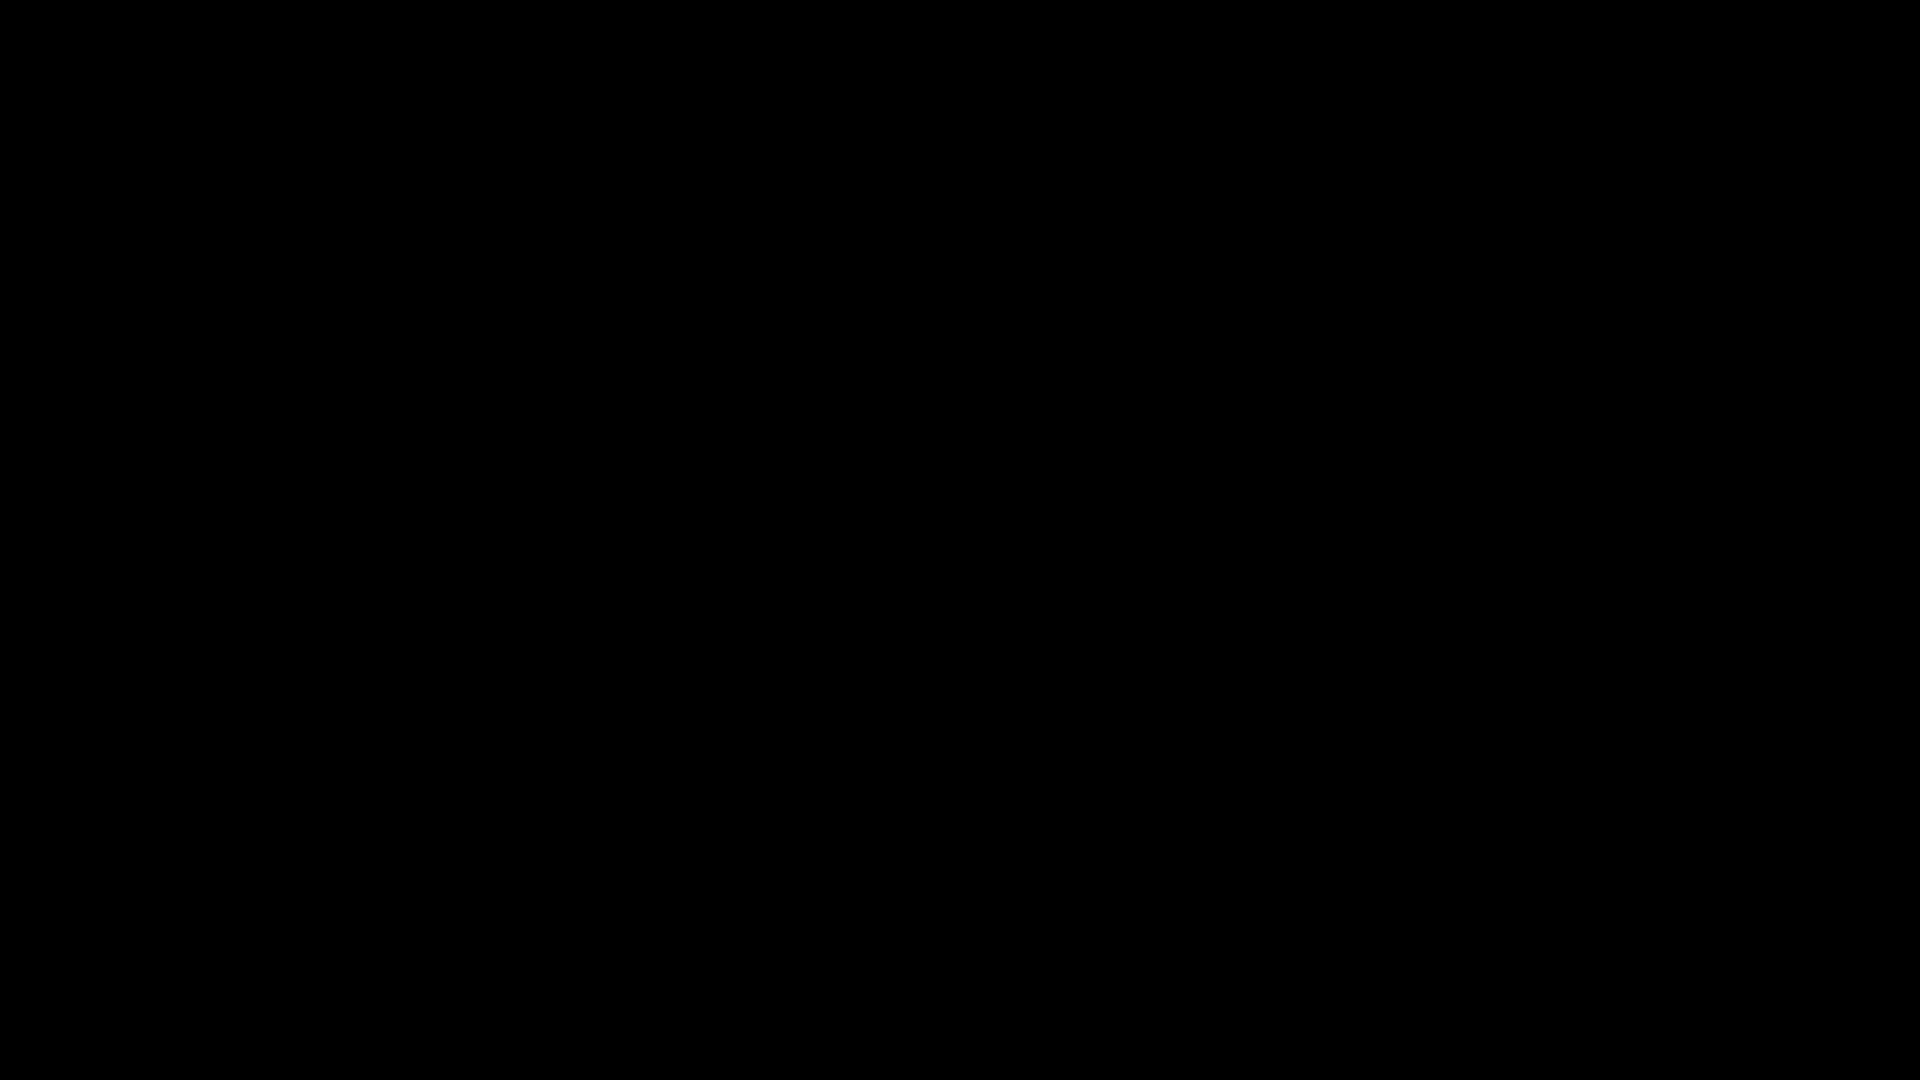 Grand Strategy, Martin Anward, Paradox Interactive, Planet Destroyers, Planet Killers, Real time Strategy, Space strategy, Stellaris, Stellaris 2.0, Stellaris Apocalypse, Stellaris Cherryh, Stellaris Update, Stellaris War, Stellaris expansion, Warfare Defined, Wiz, Wizzington, ascension perks stellaris, omfgblondie, stellaris civics, Stellaris: Apocalypse - First Look GIFs